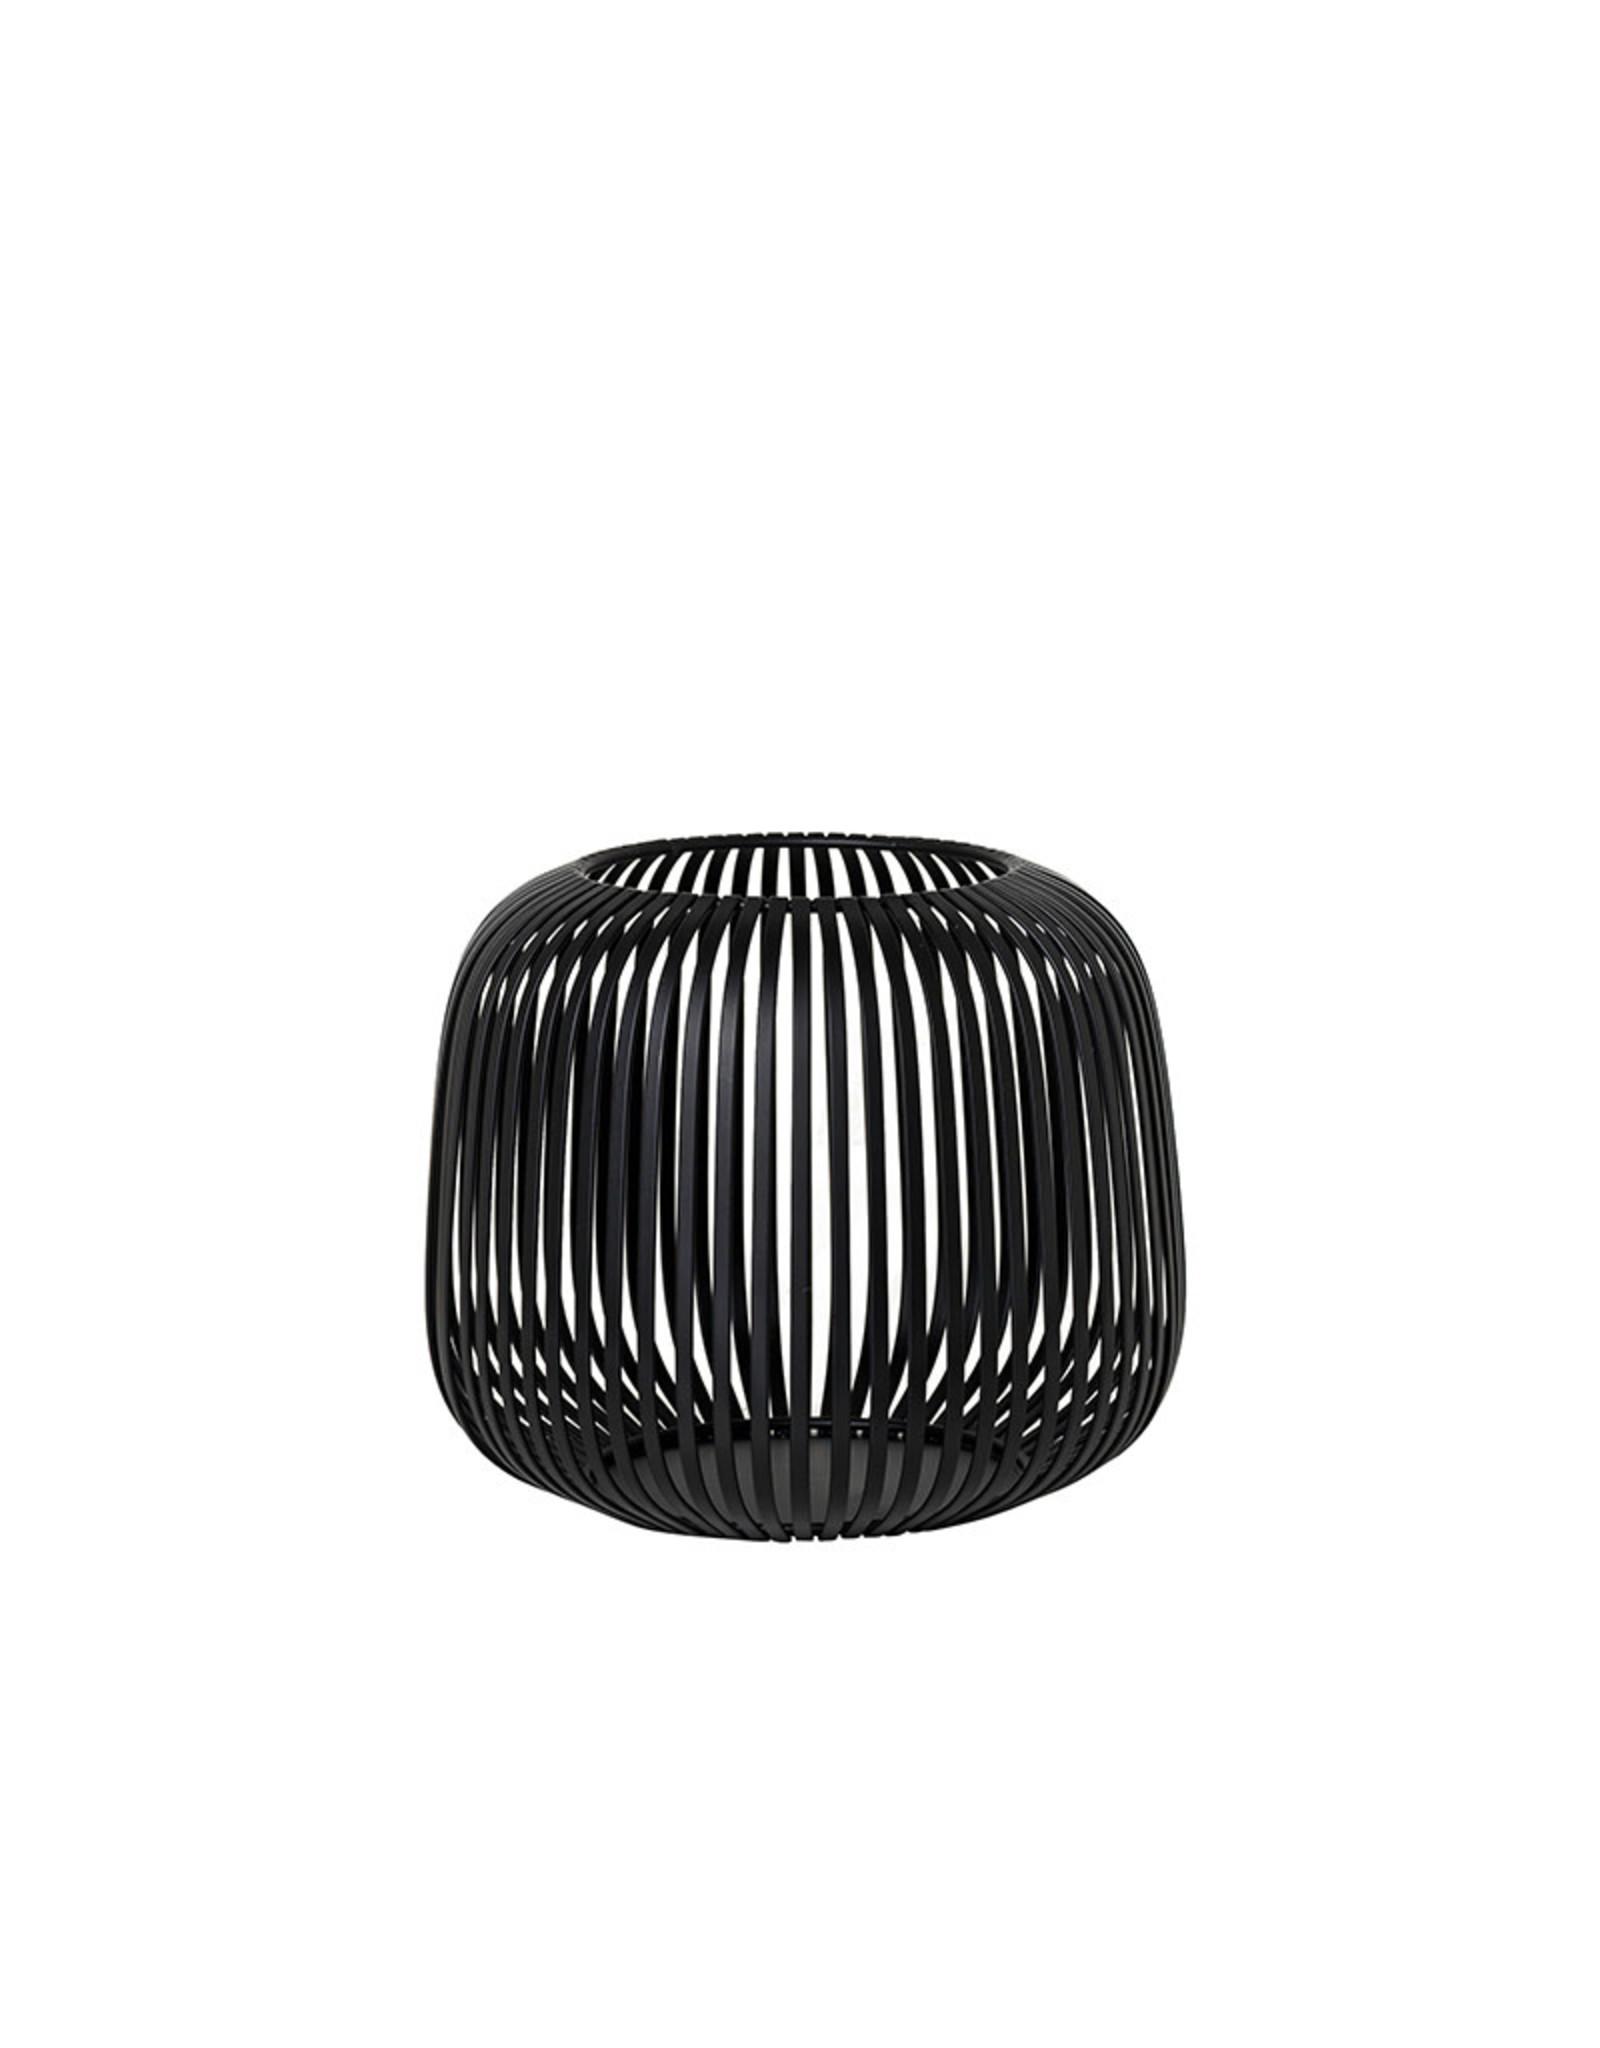 BLOMUS BLOMUS LITO Lantern S Black